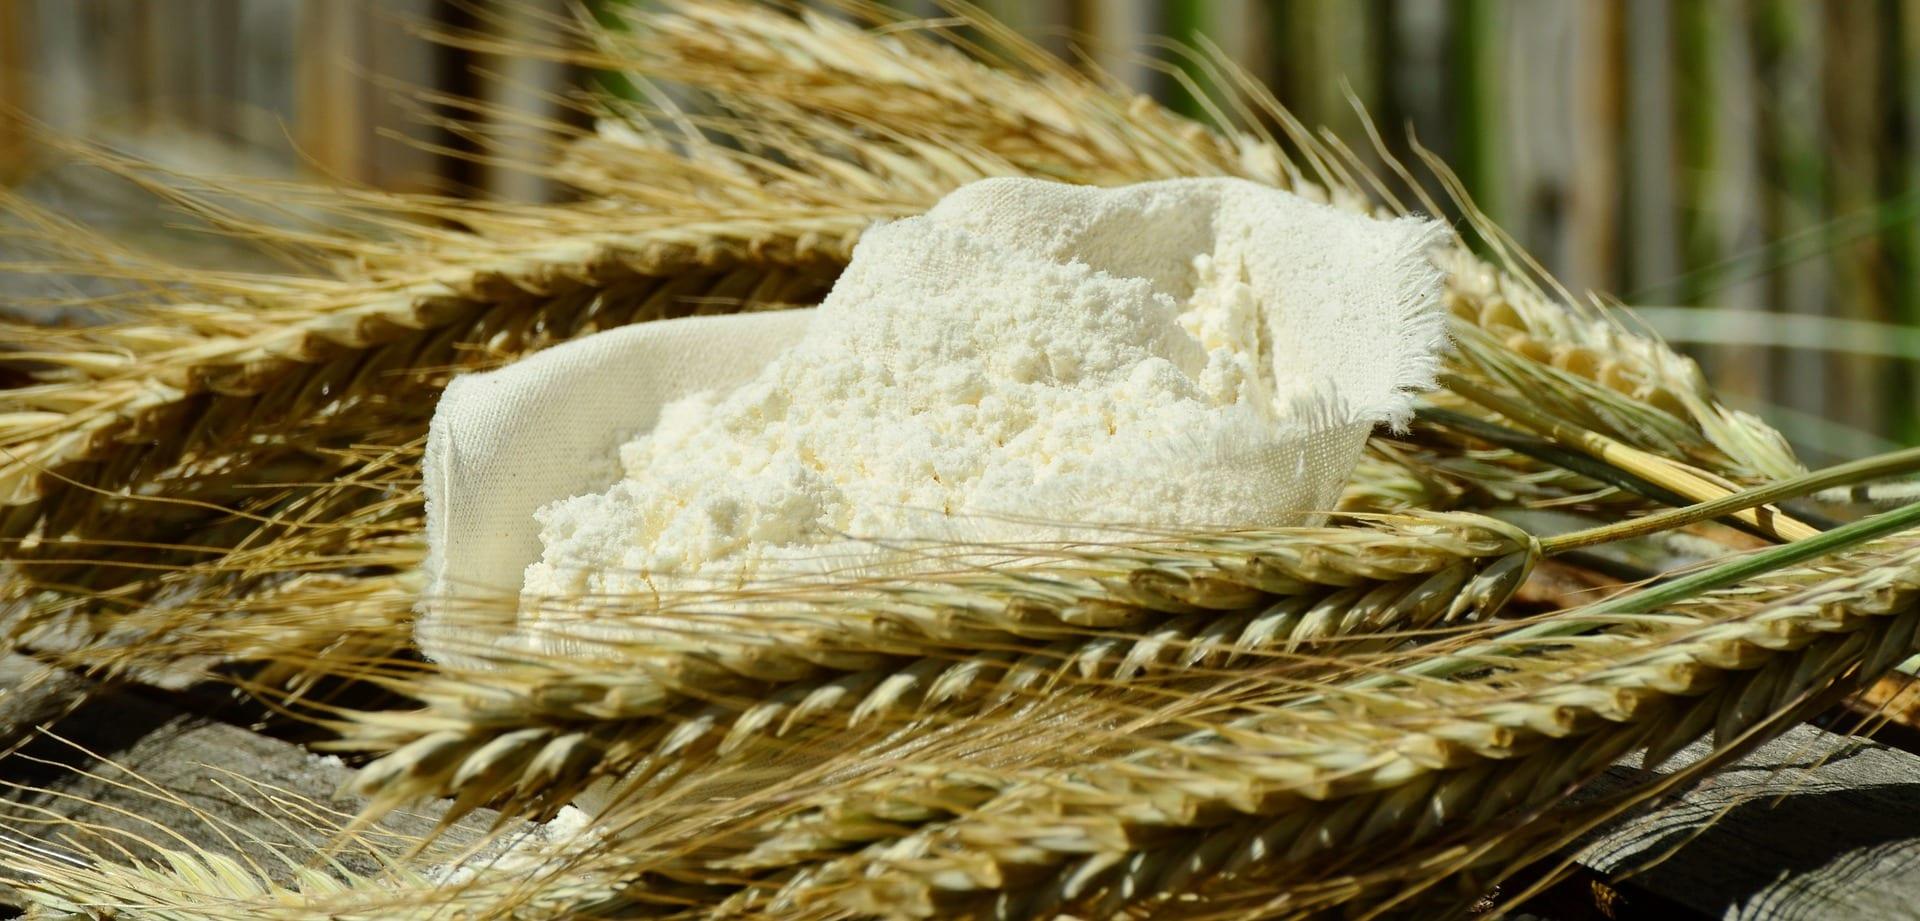 Oplatilo sa pestovať pšenicu alebo skôr jačmeň?